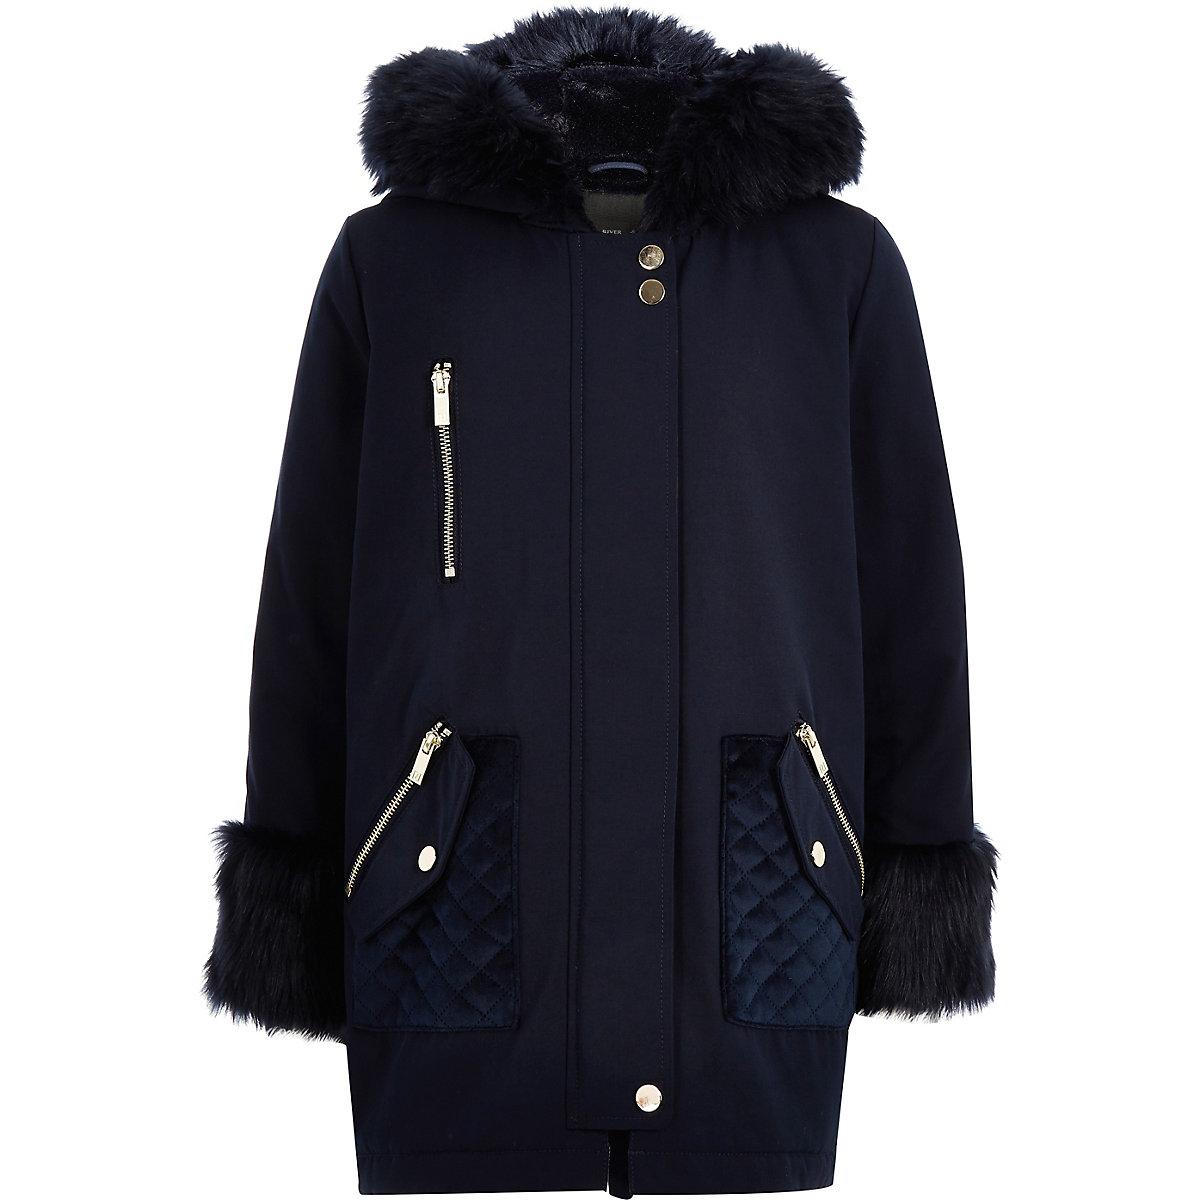 Girls navy faux fur trim parka jacket